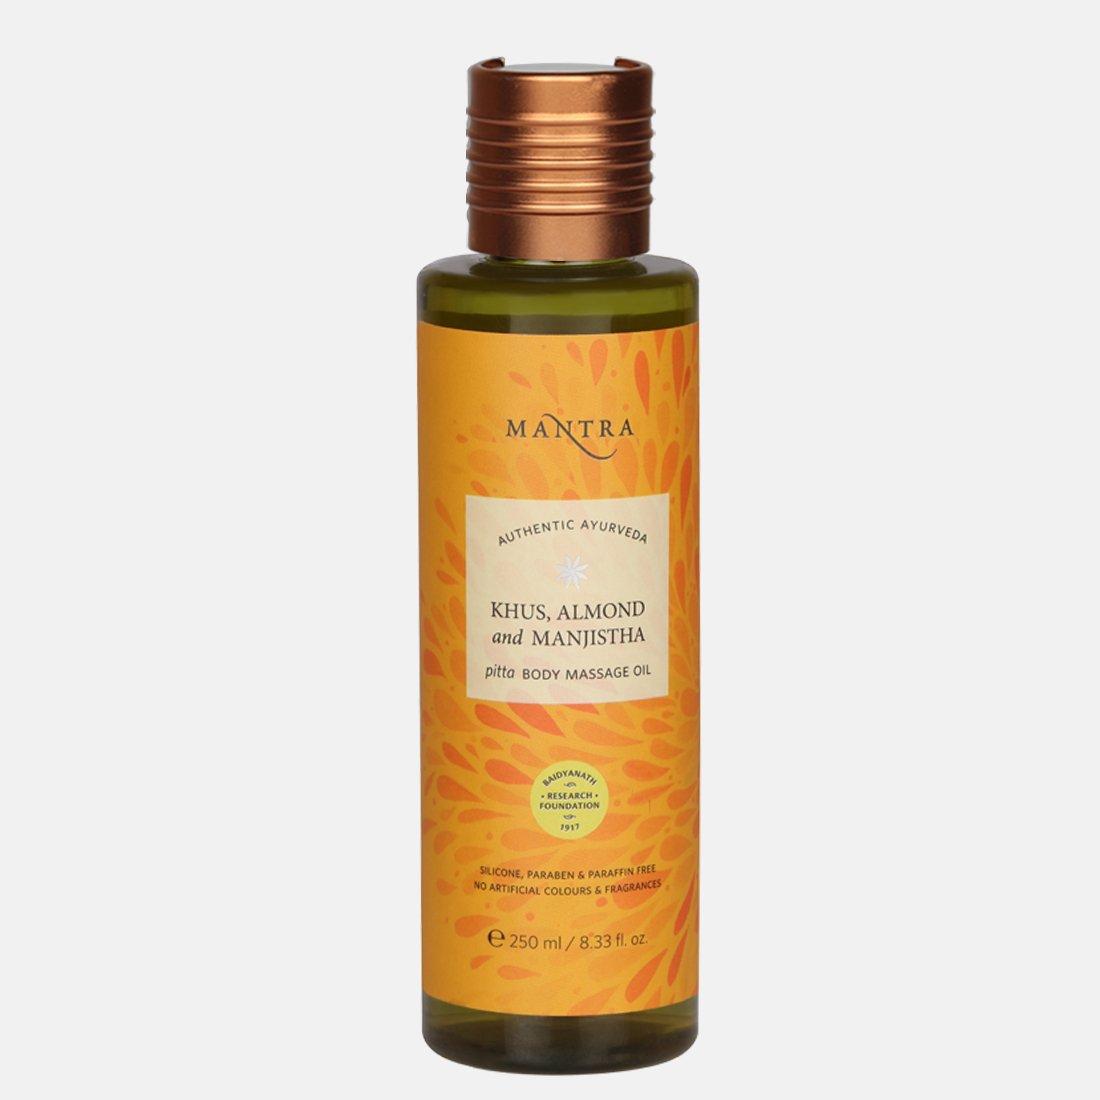 Khus, Almond & Manjistha Pitta Body Massage Oil